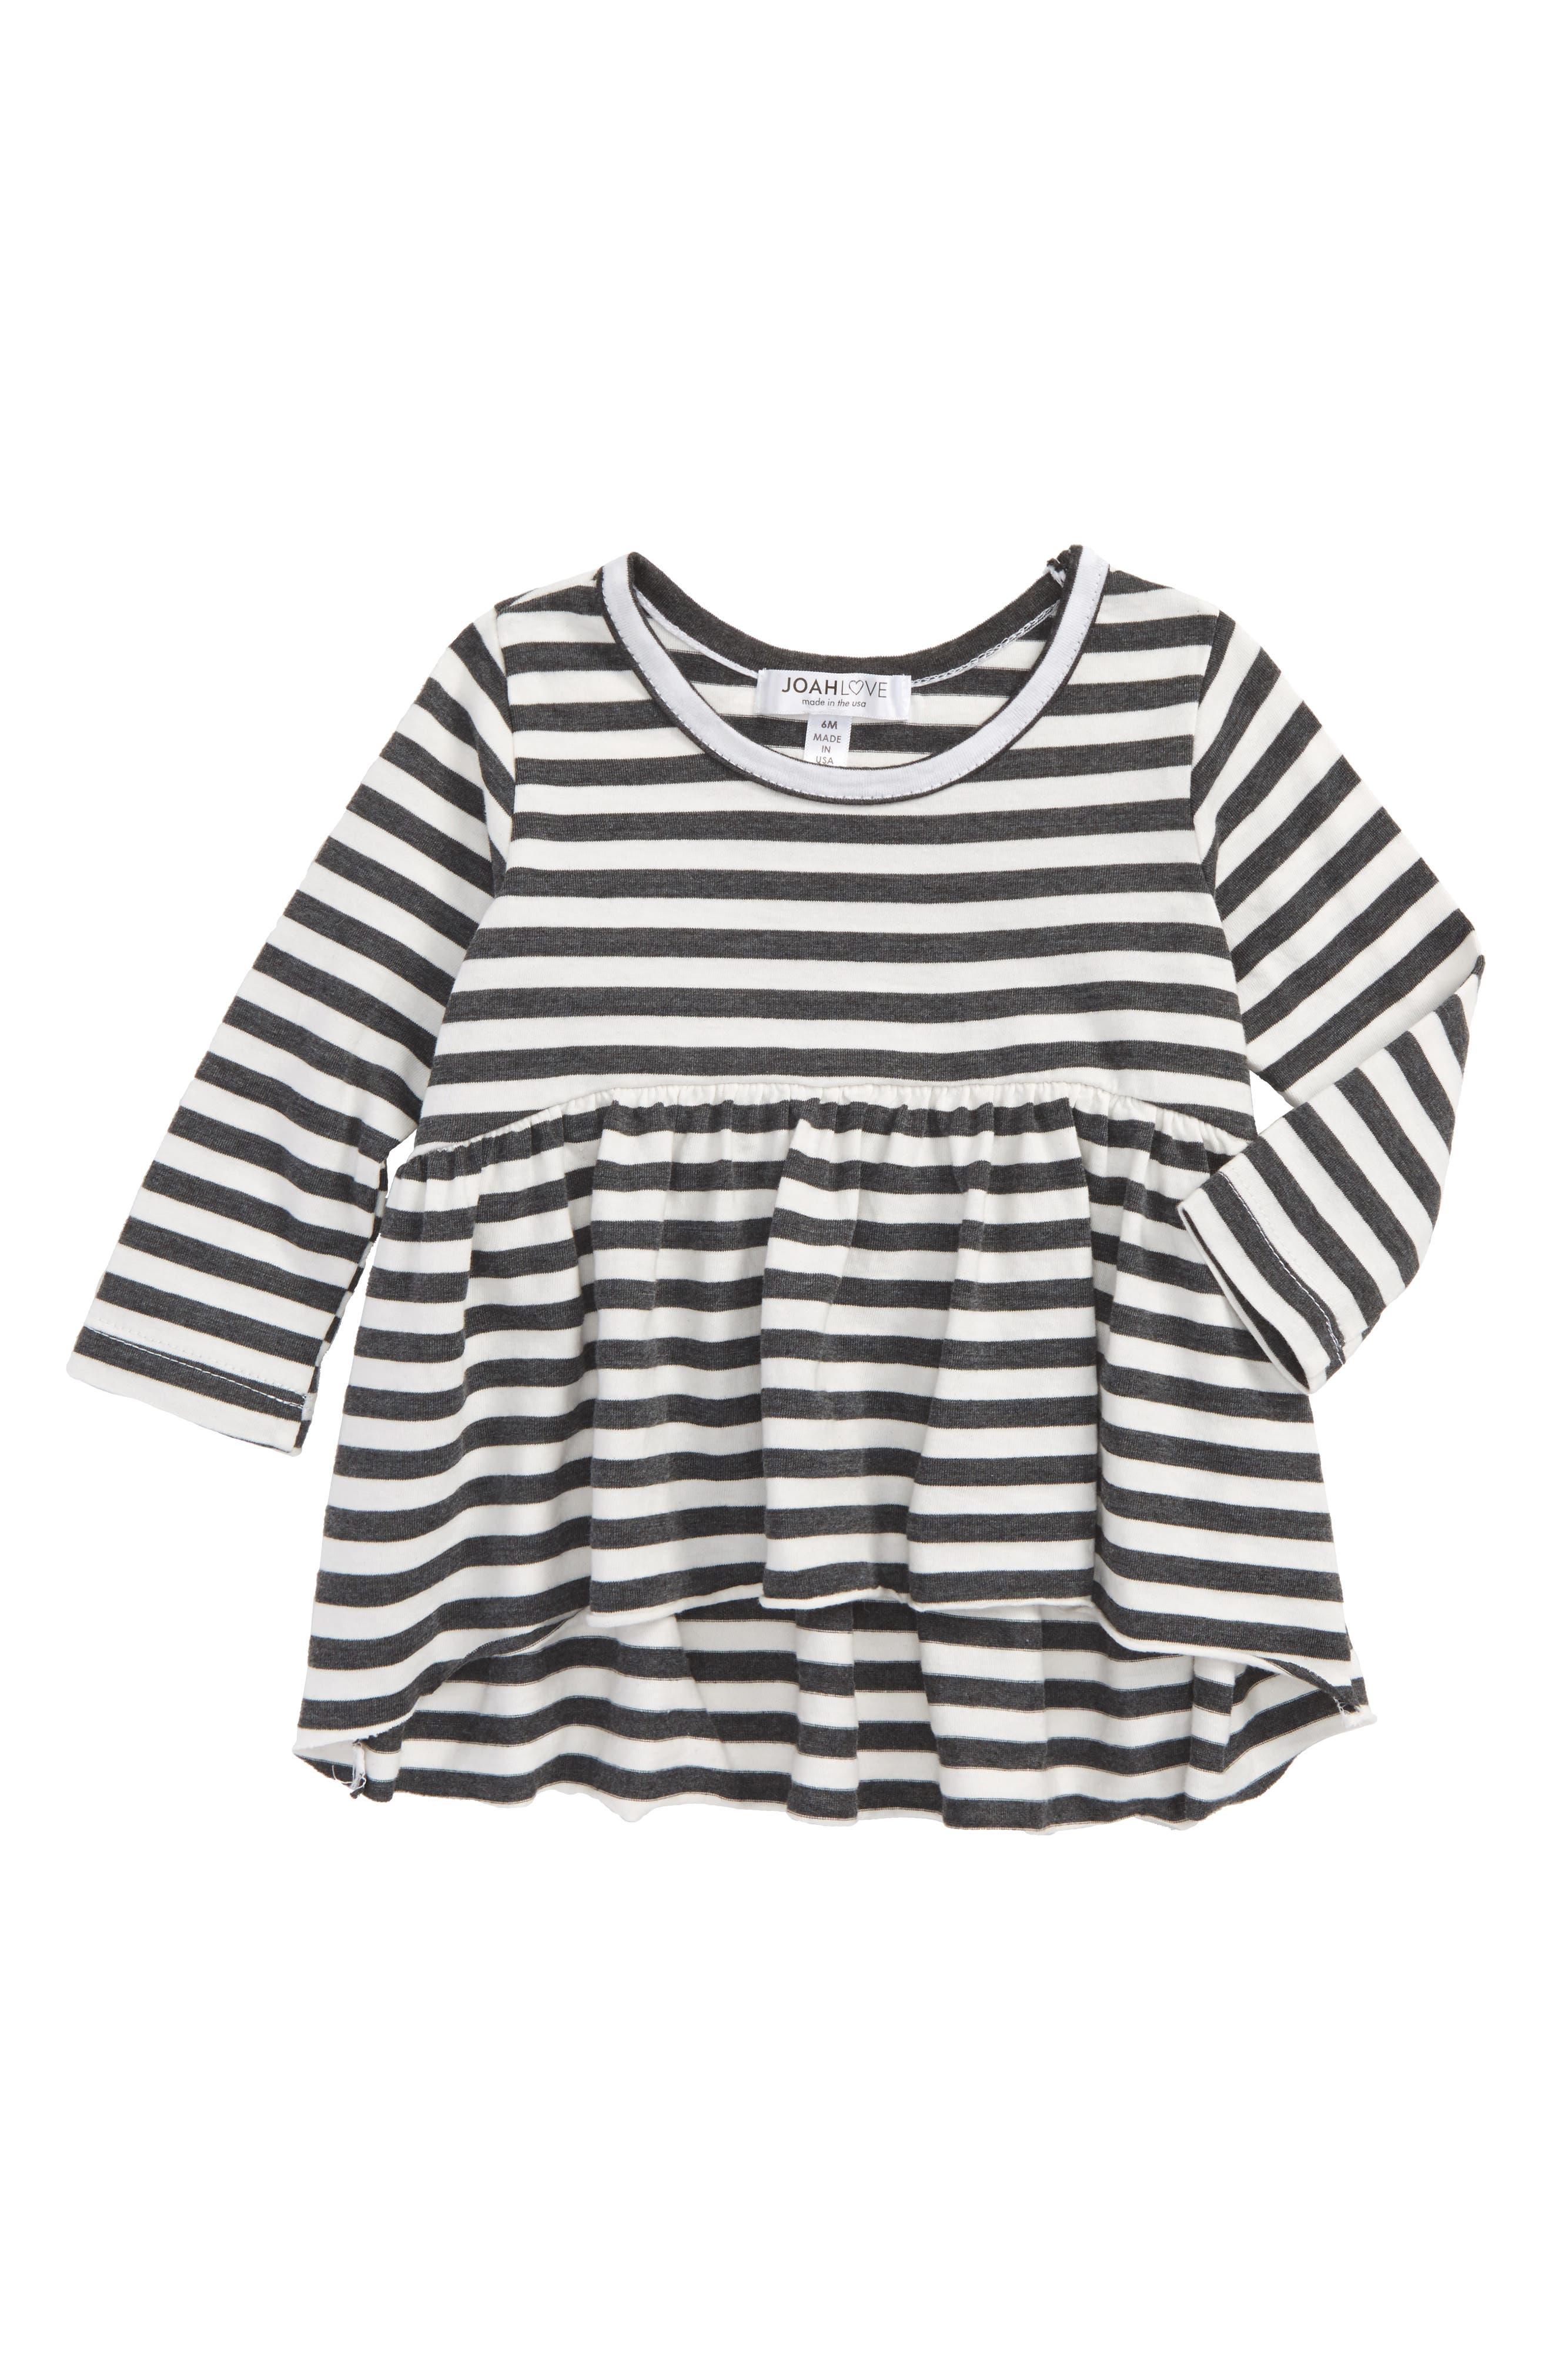 Alternate Image 1 Selected - Joah Love Stripe Peplum Tee (Baby Girls)